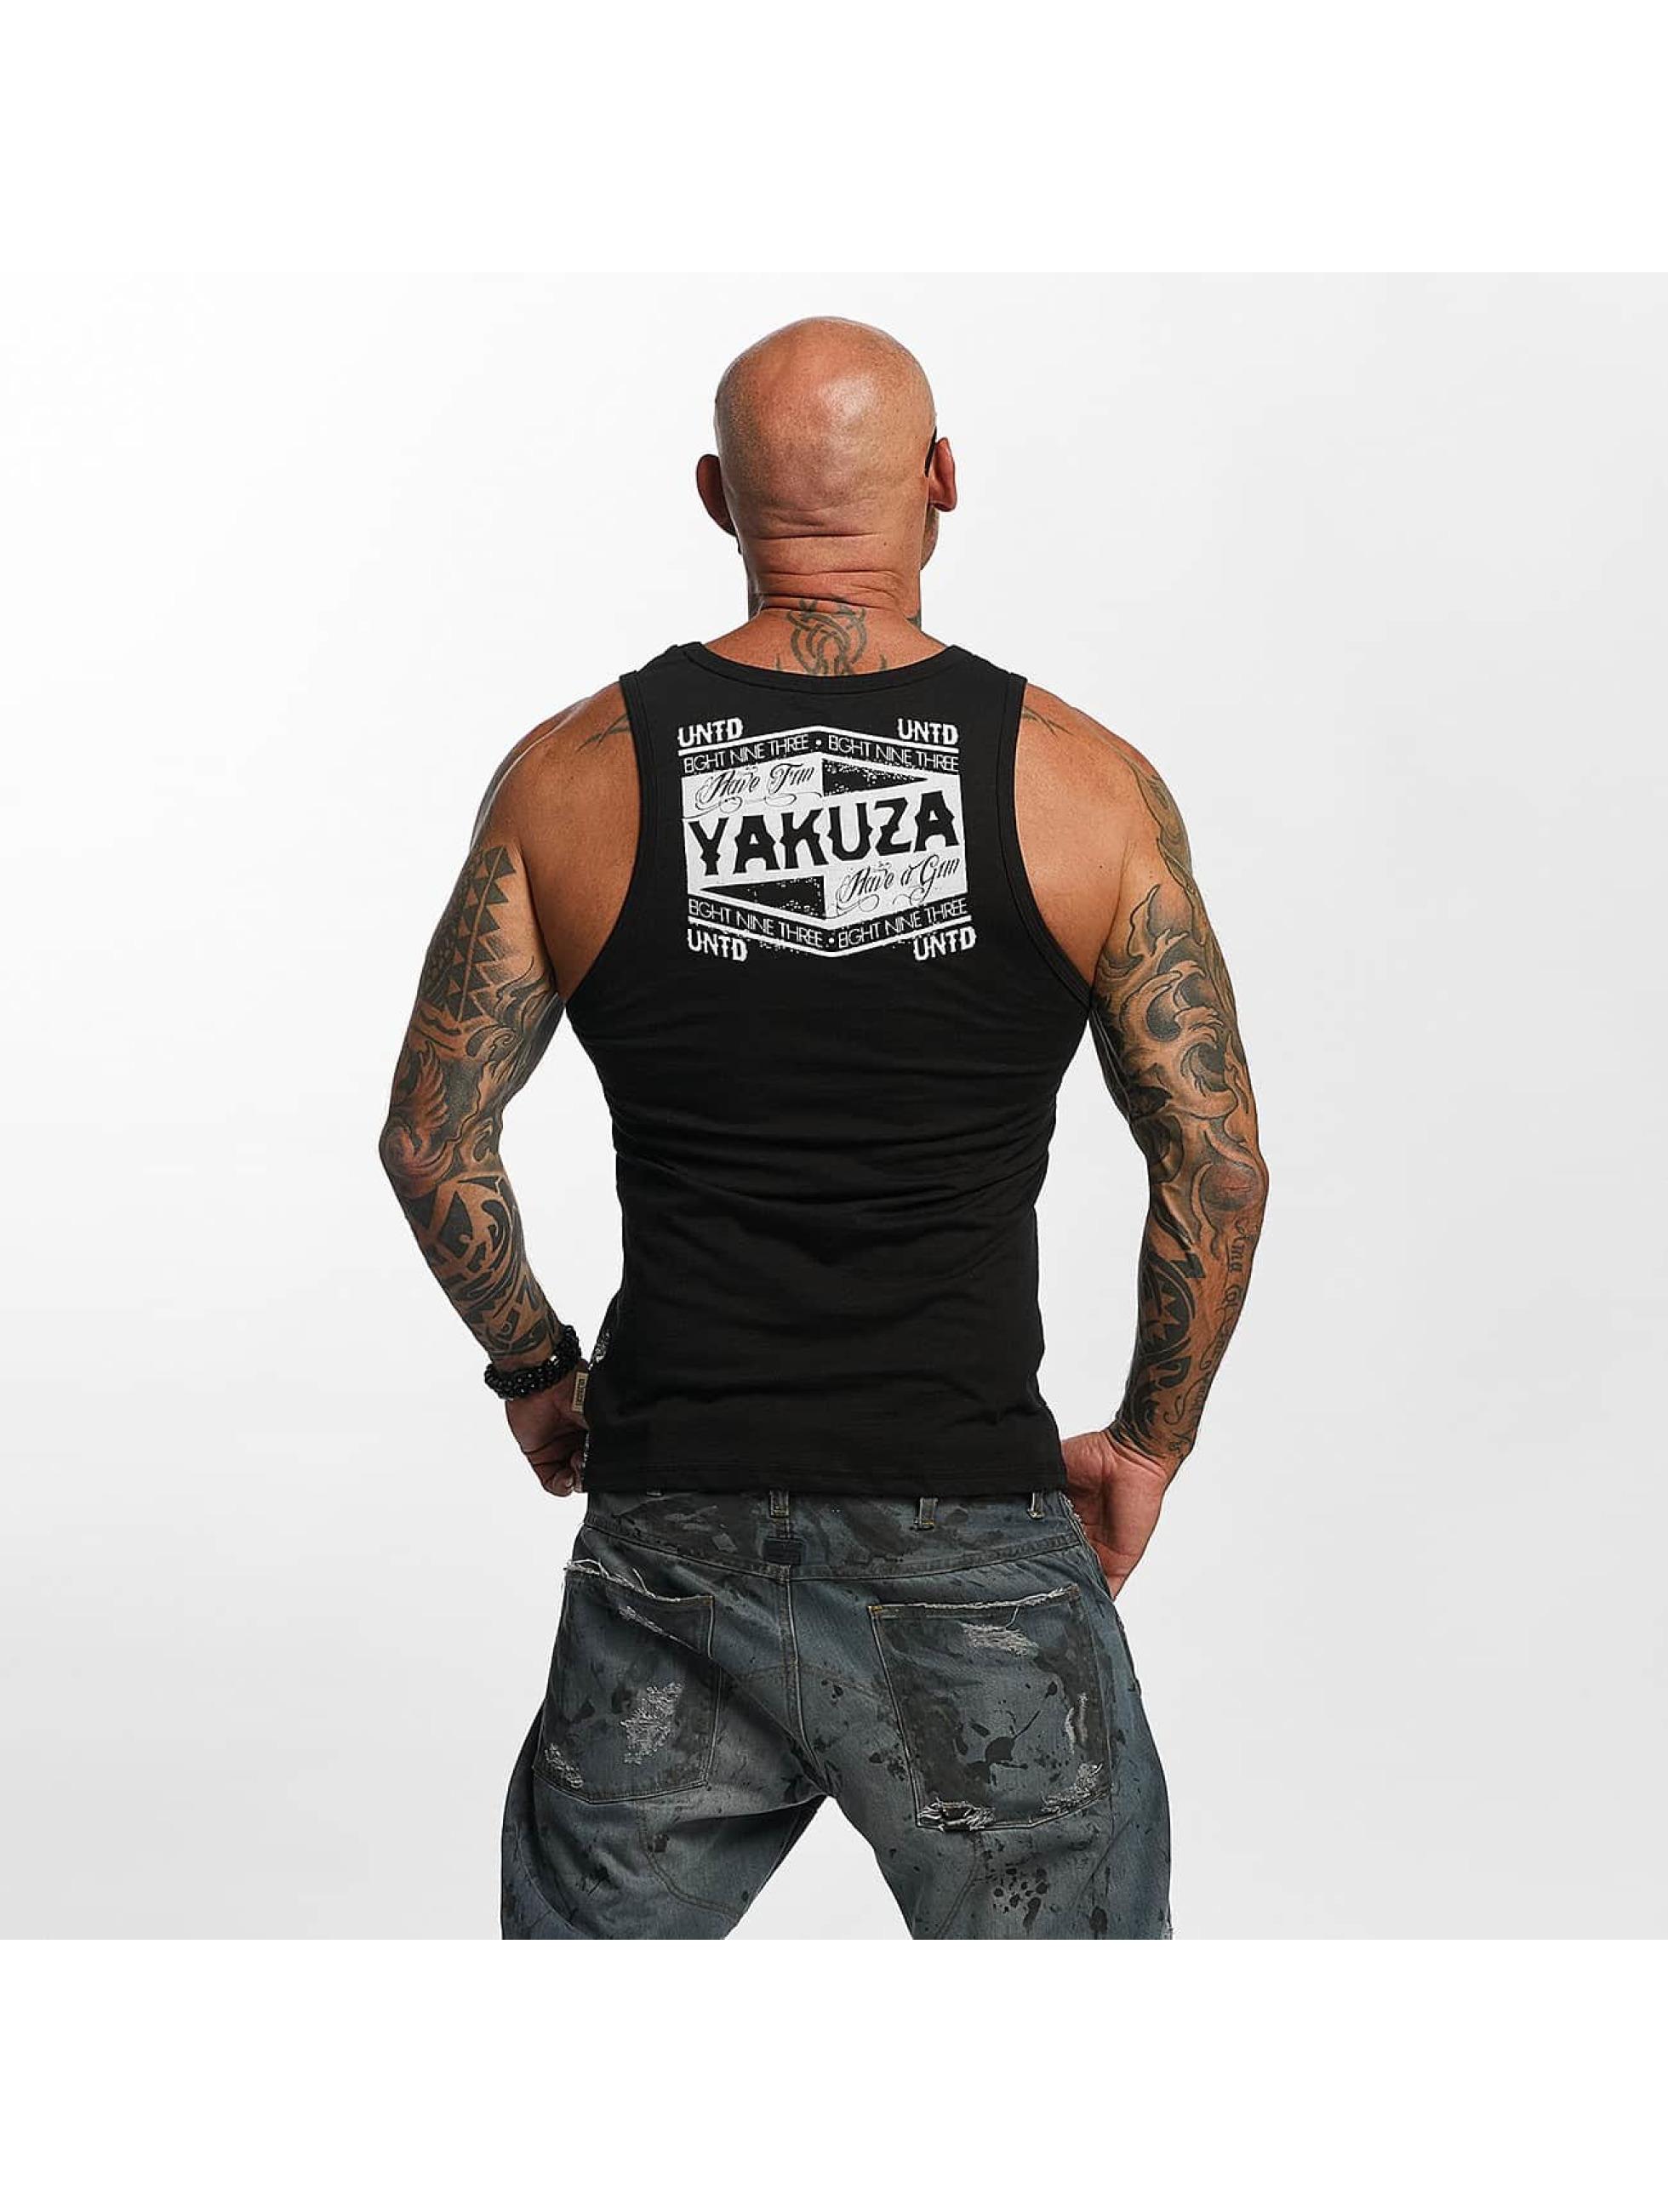 Yakuza Tank Tops Untd czarny